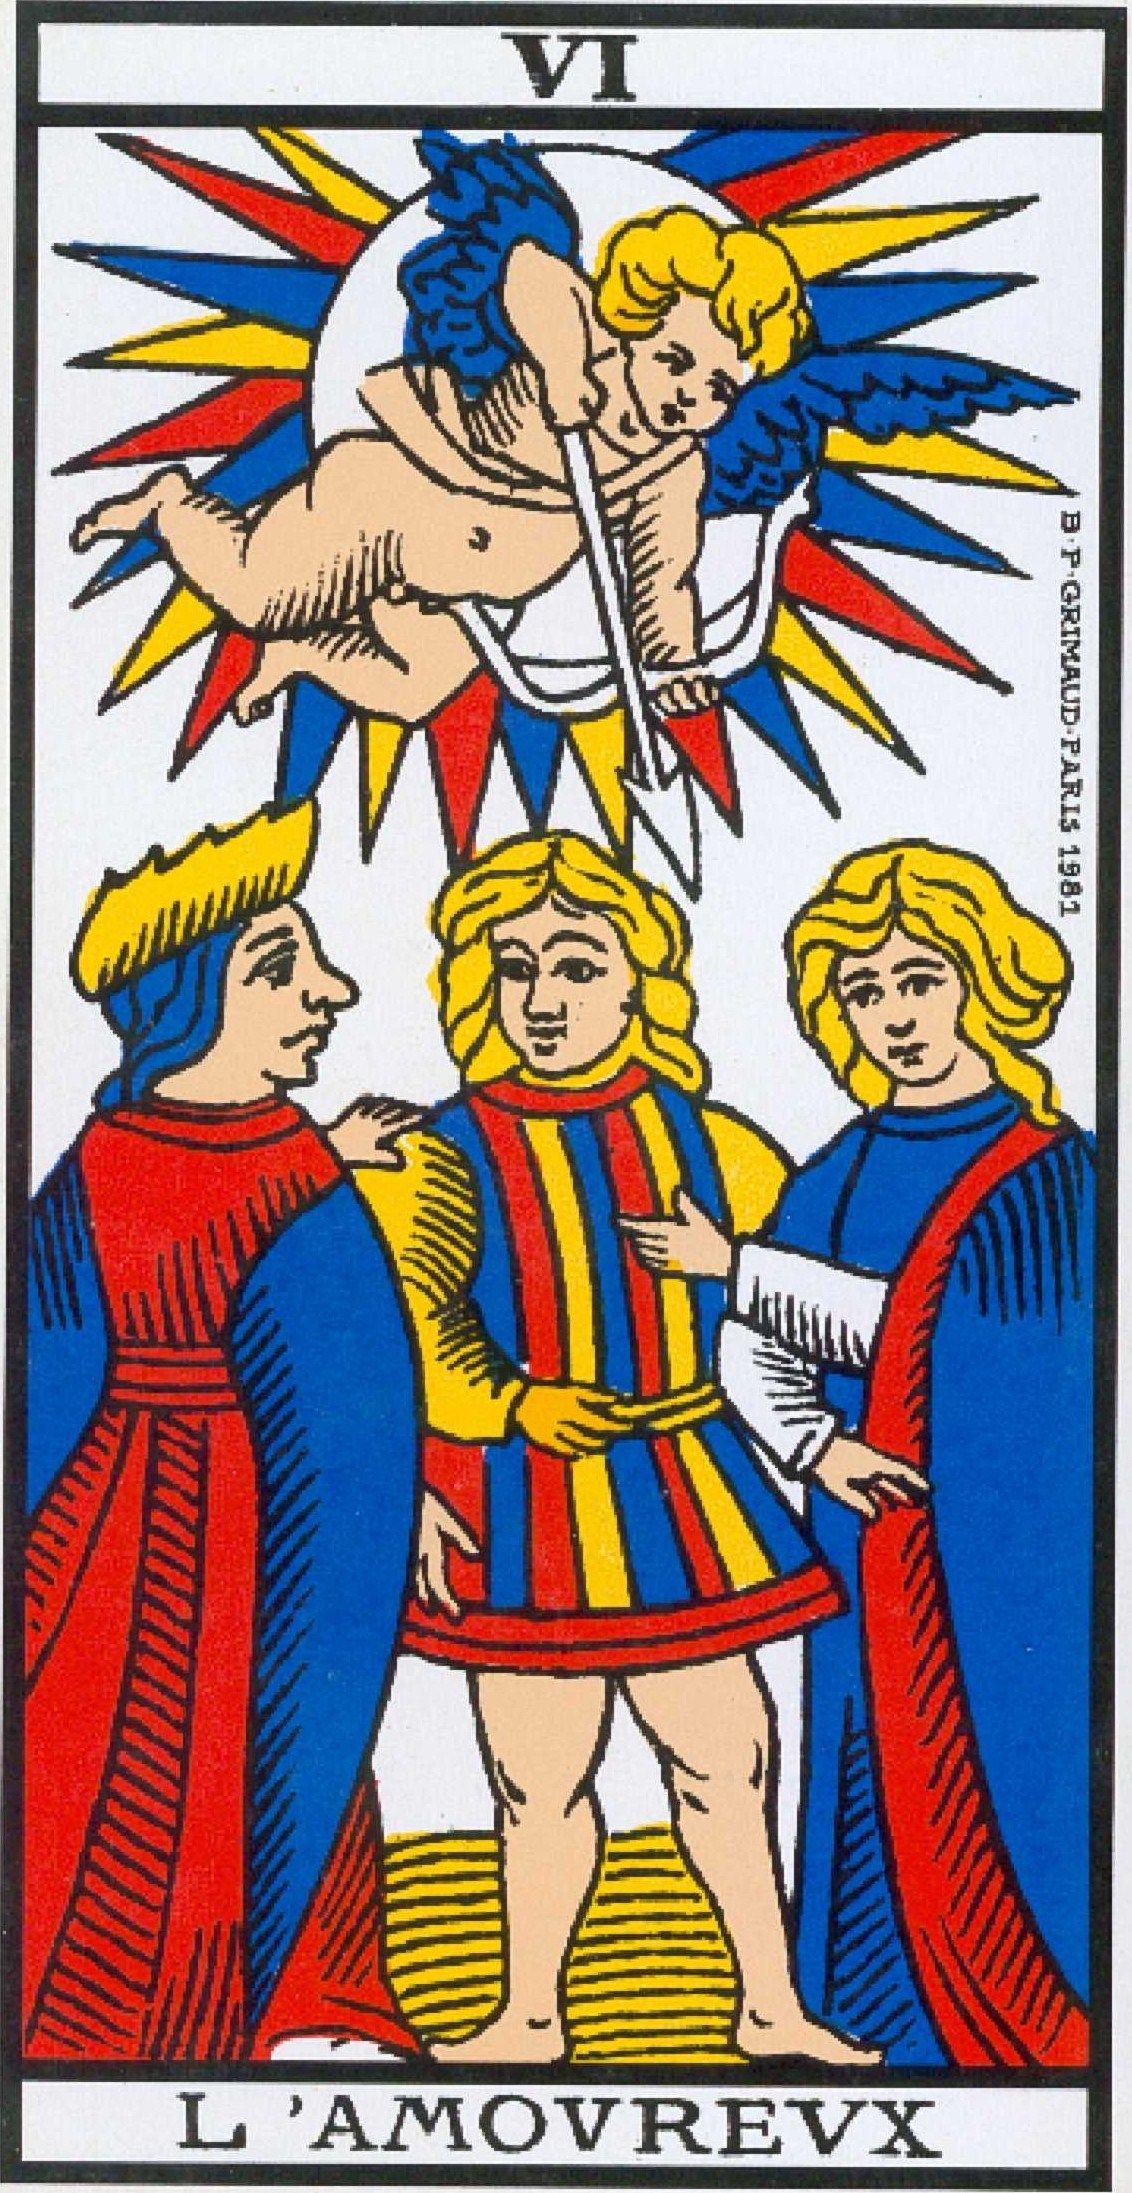 Marseille Tarot Cards 2010: VI Gli Amanti / L'Amoureux / The